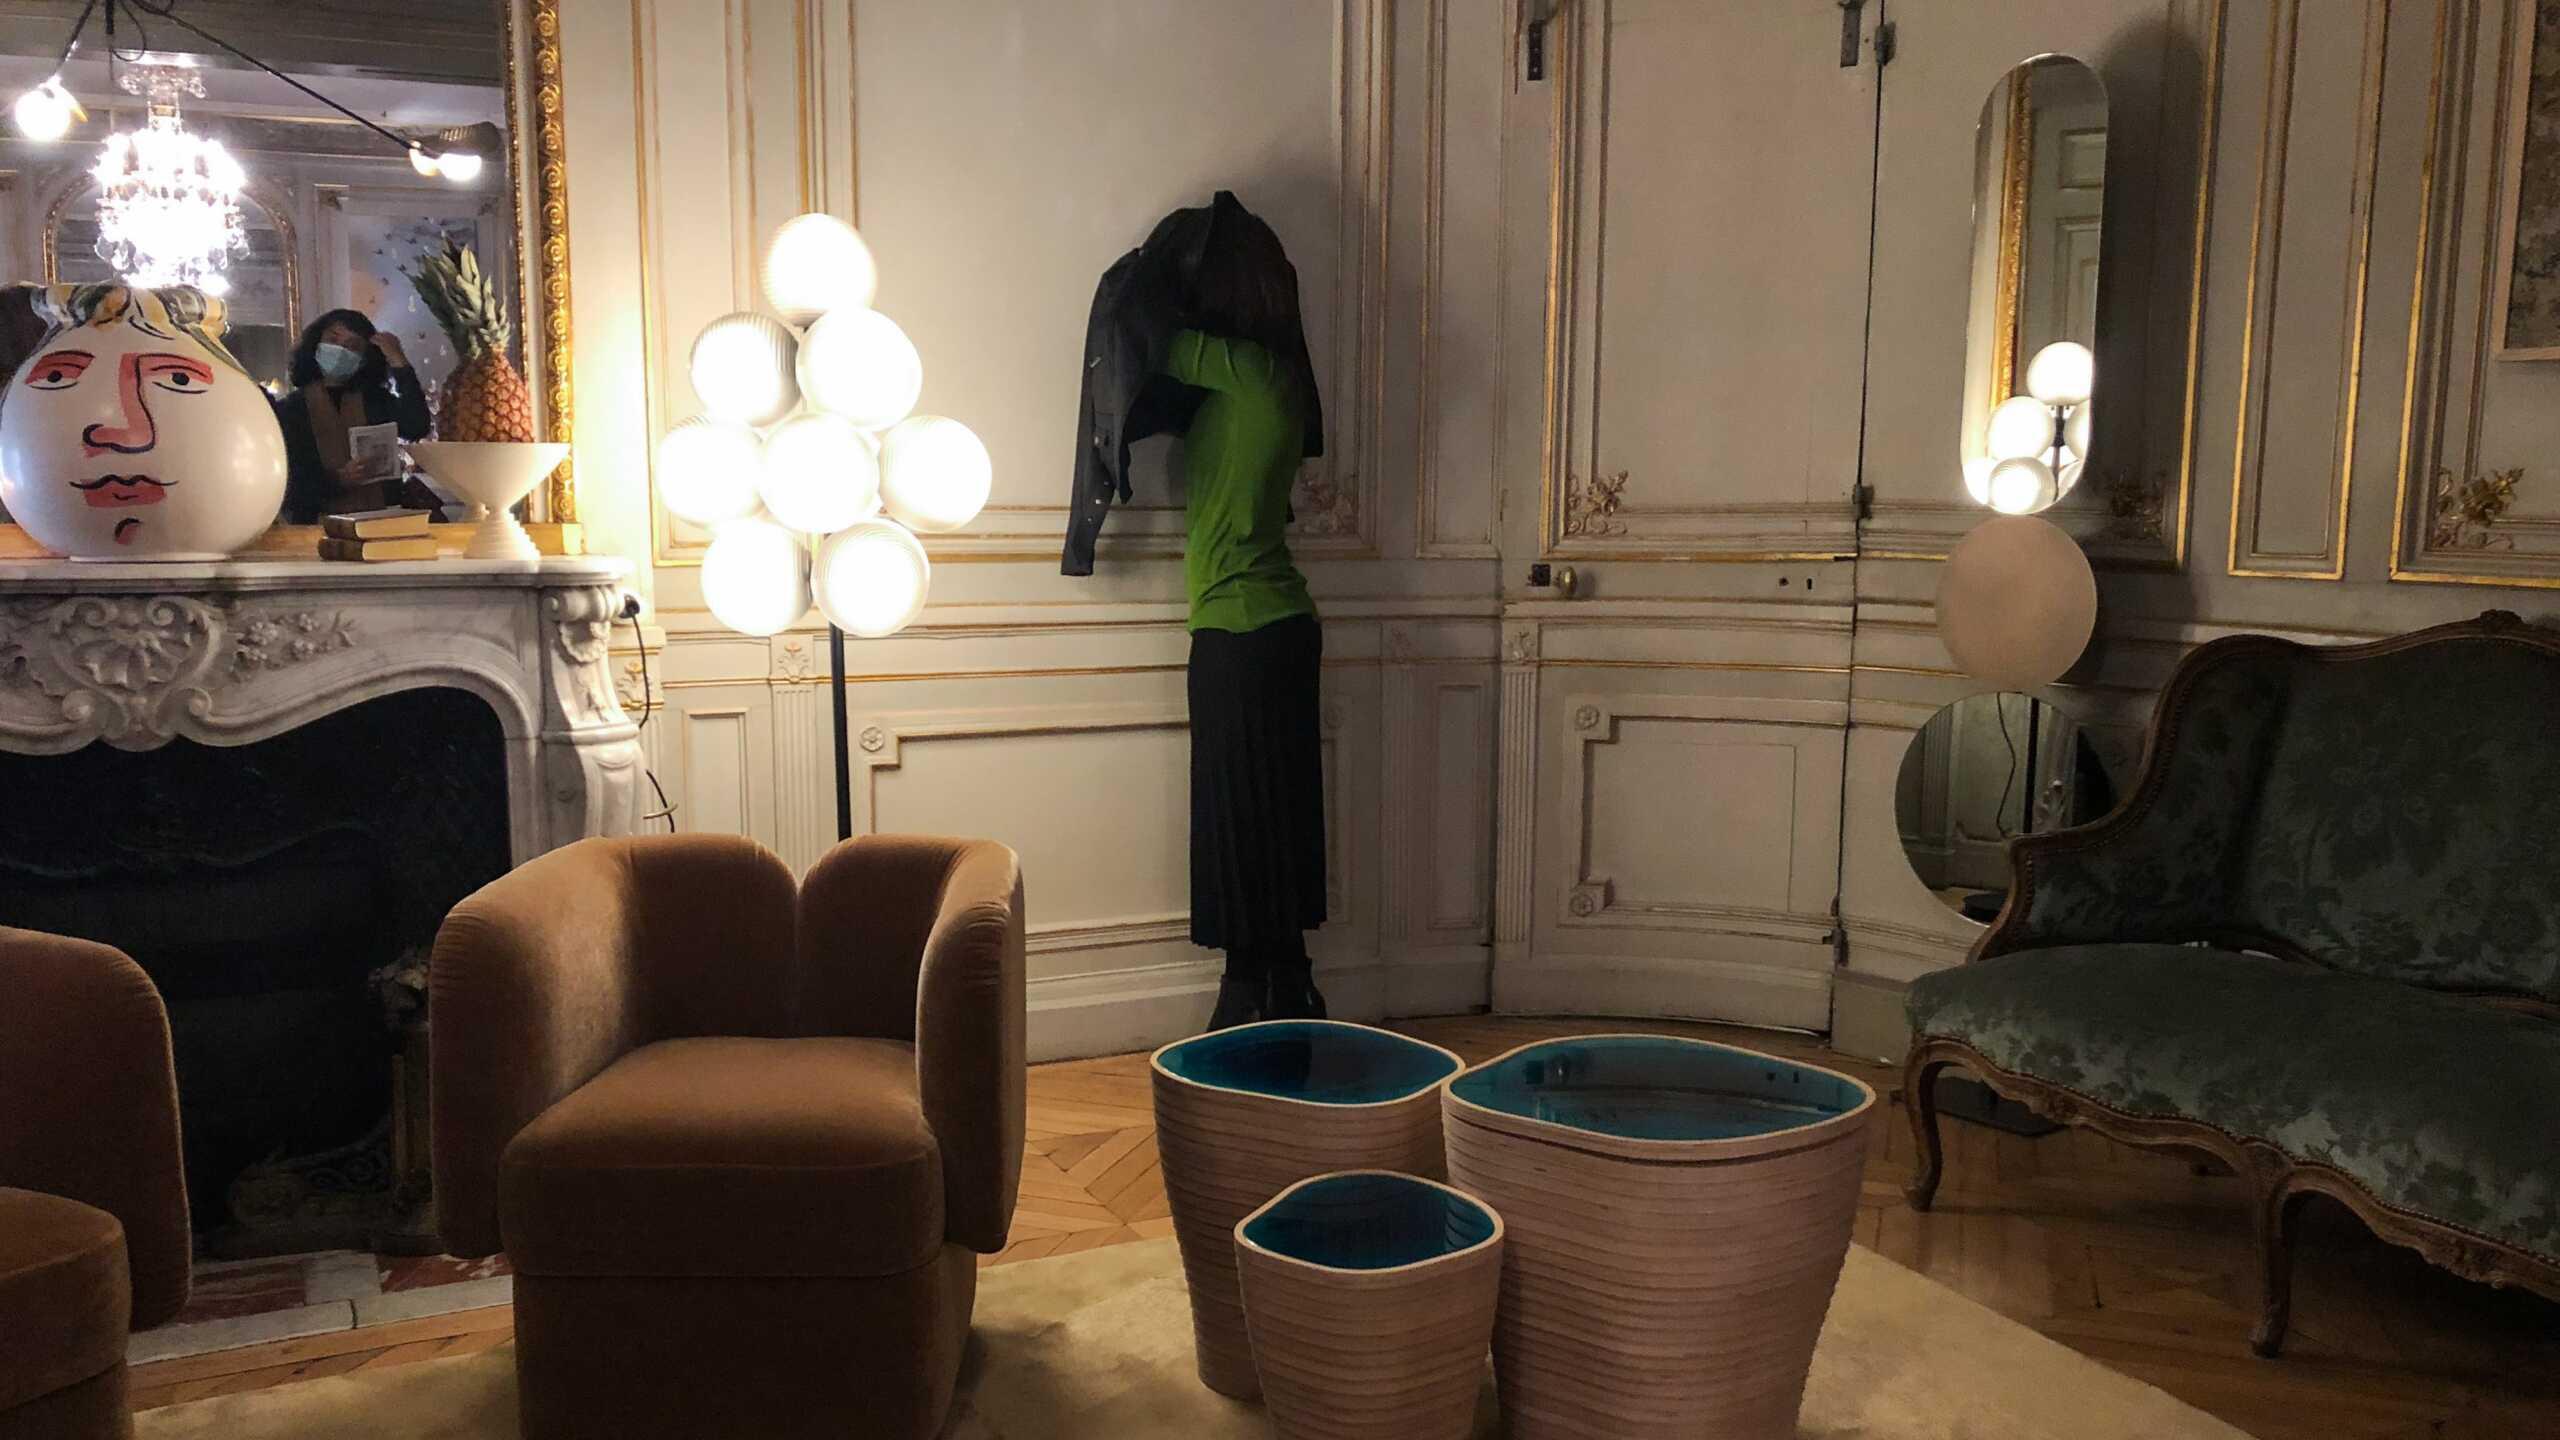 Sebastian Herkner's lamp, Daniel Firman's human sculpture & Julien Lagueste's nested coffee tables